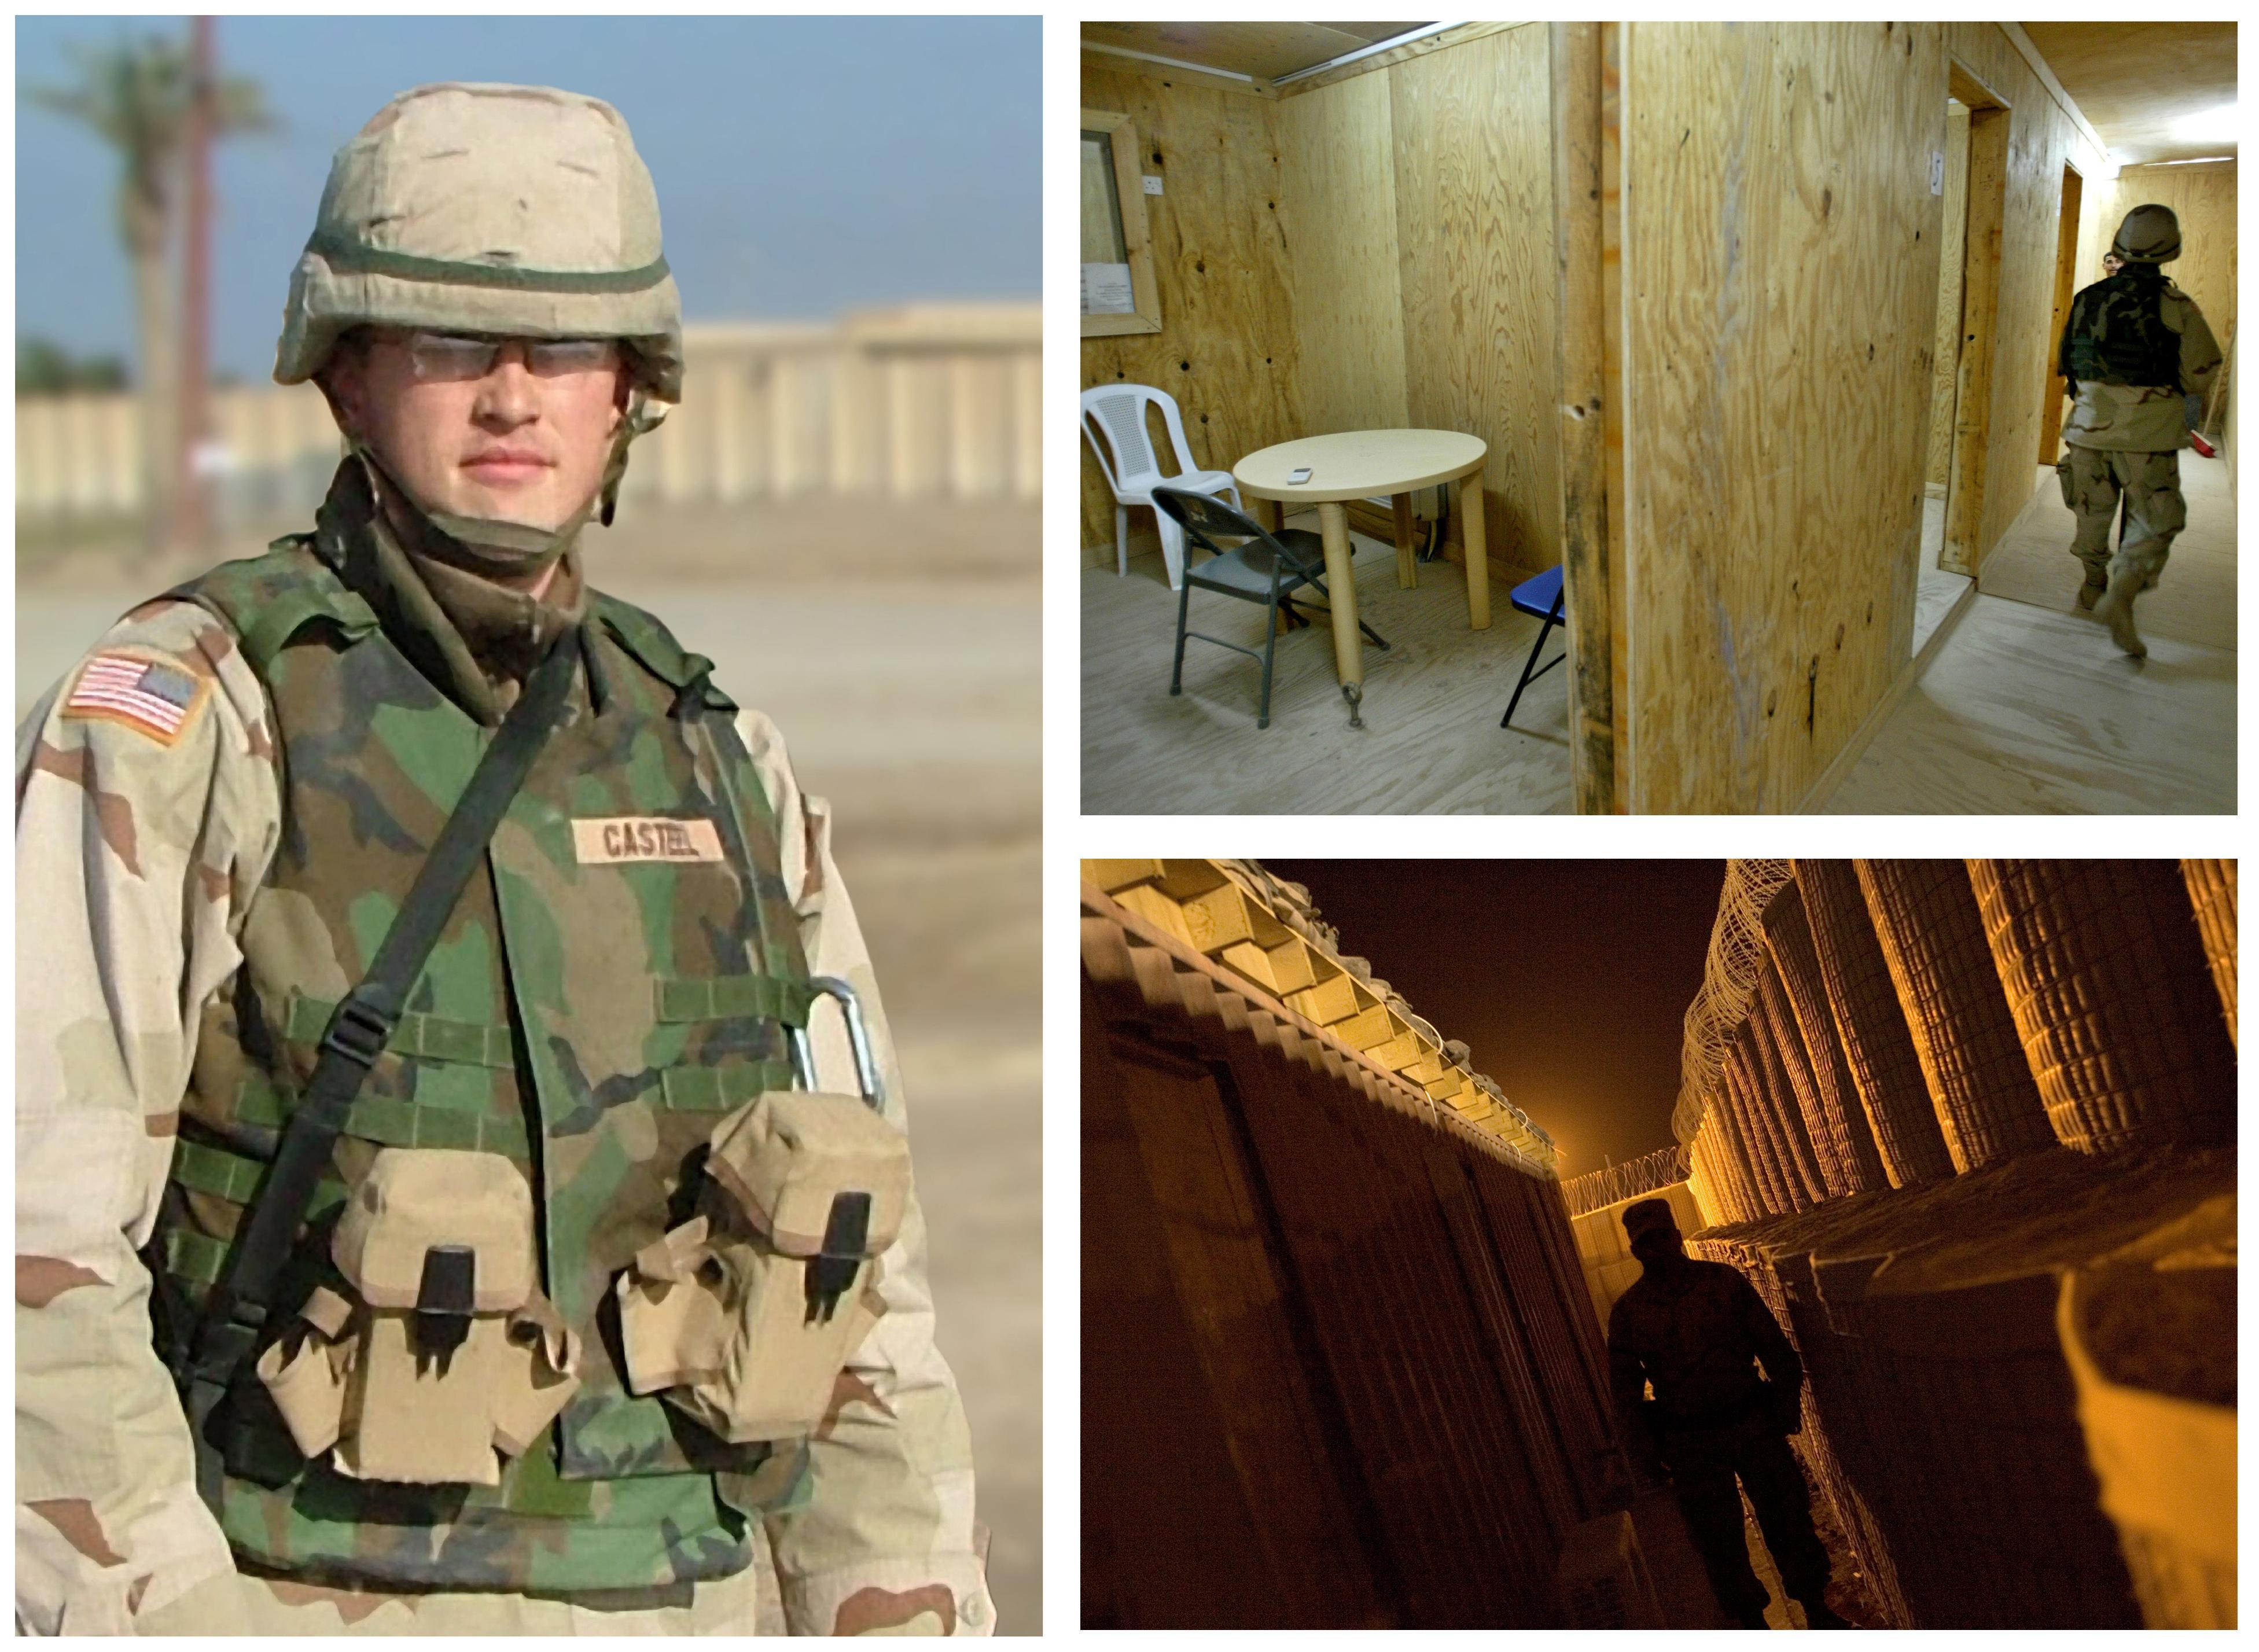 casteel in Iraq collage